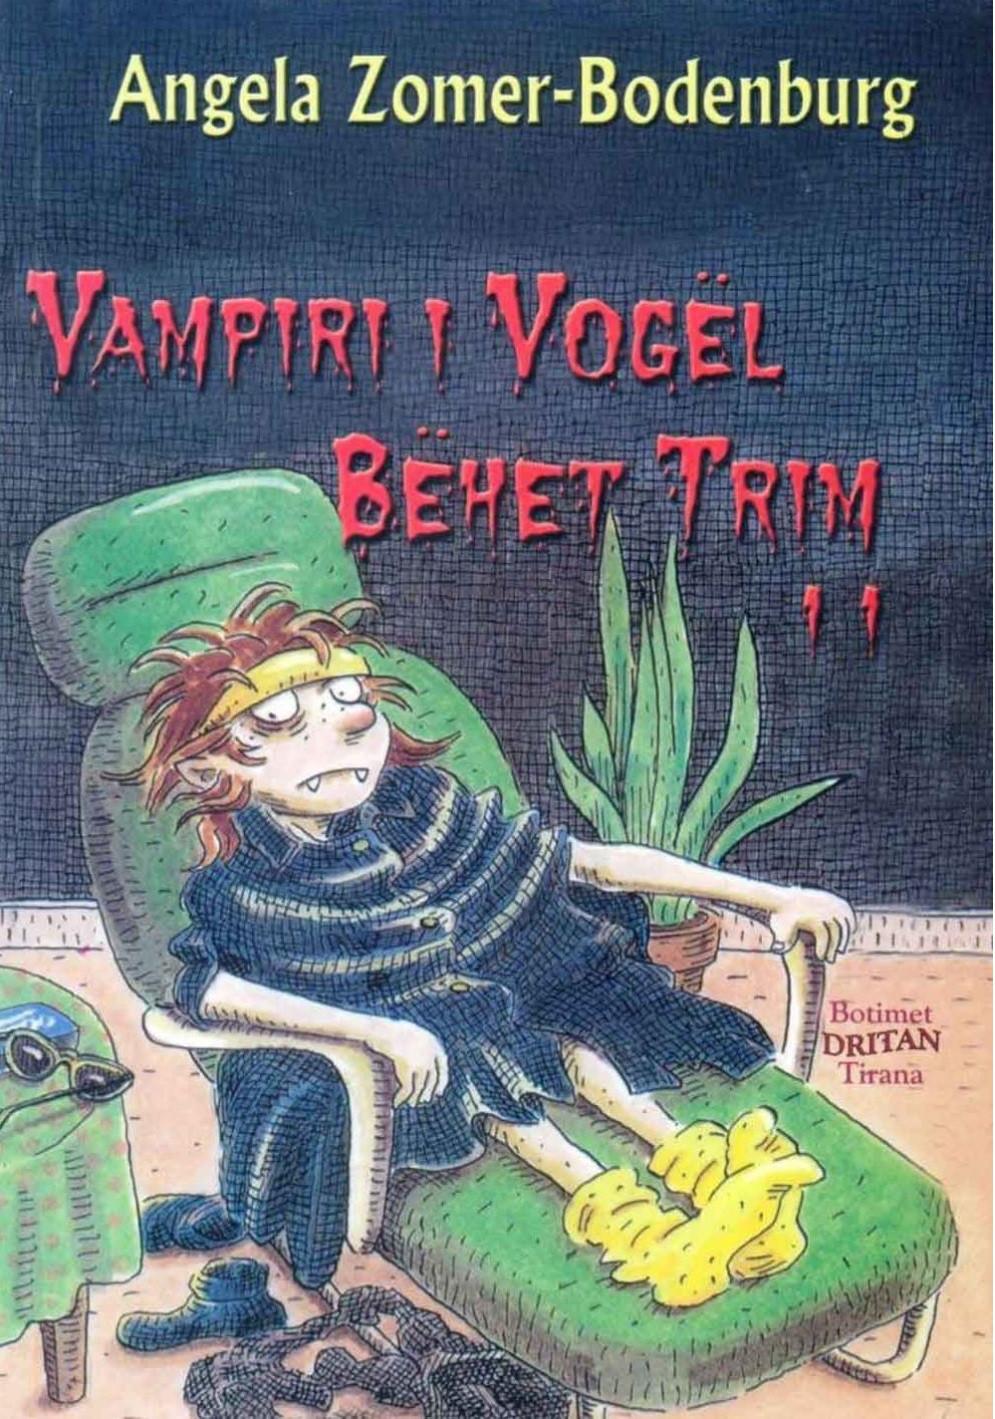 Vampiri i vogel 11 behet trim